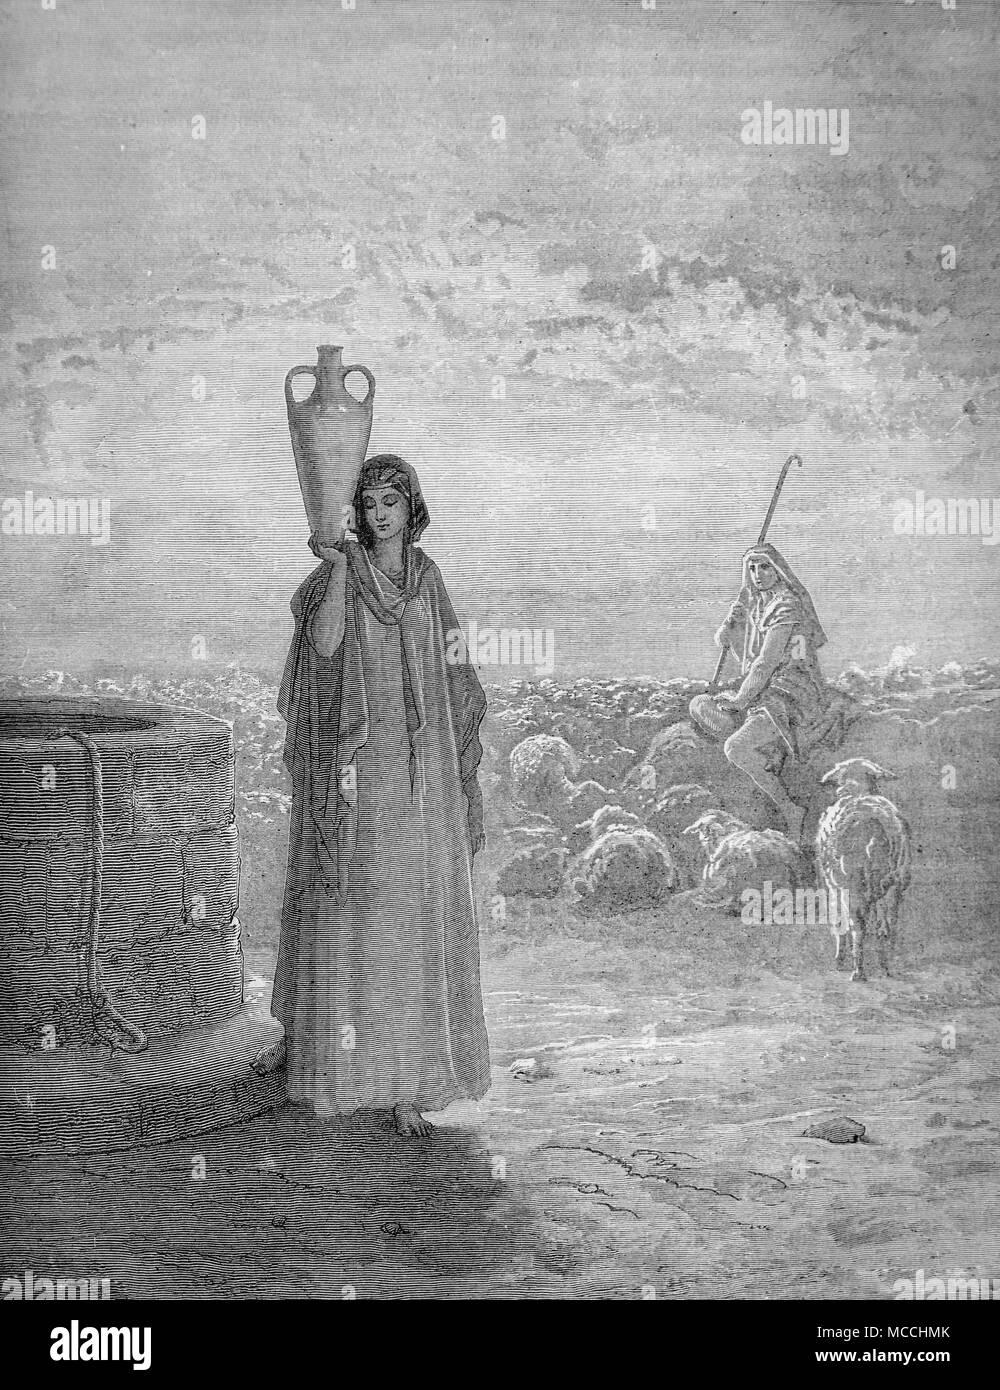 Jacob keeping Laban's Flocks. Illustration by Gustave Doré. - Stock Image